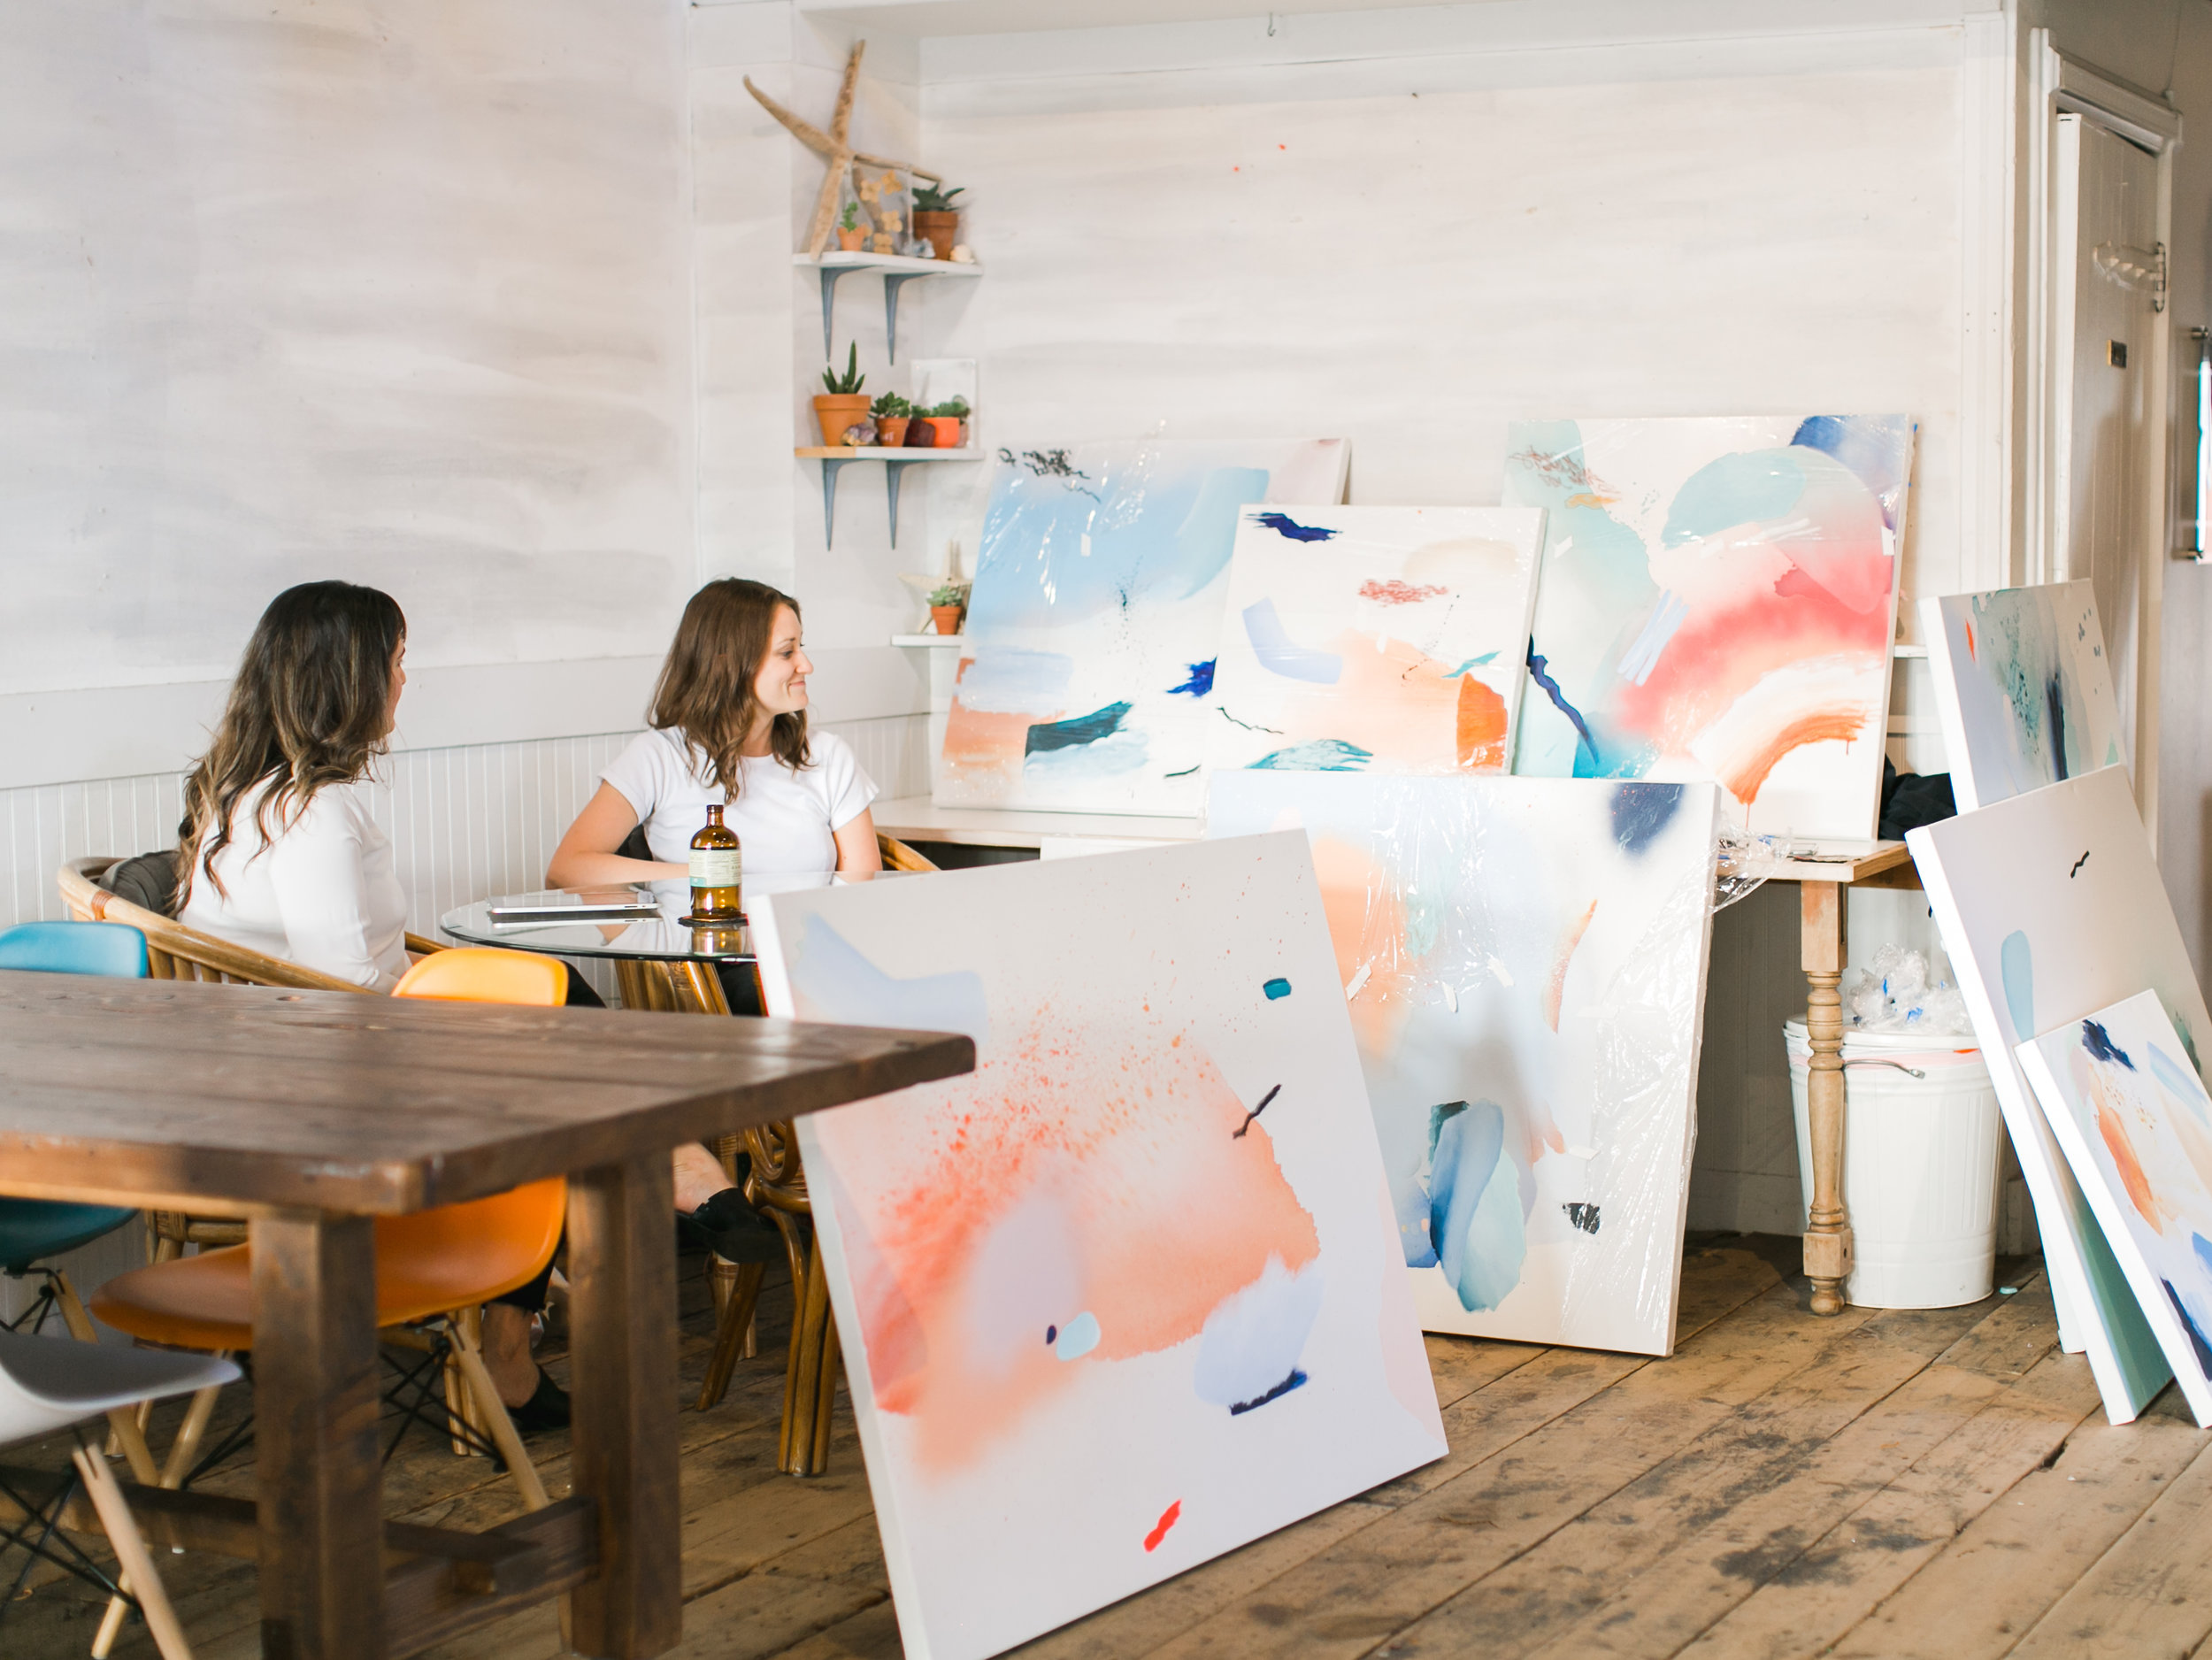 Artist Residency at SOURCED. in Laguna Beach, CA